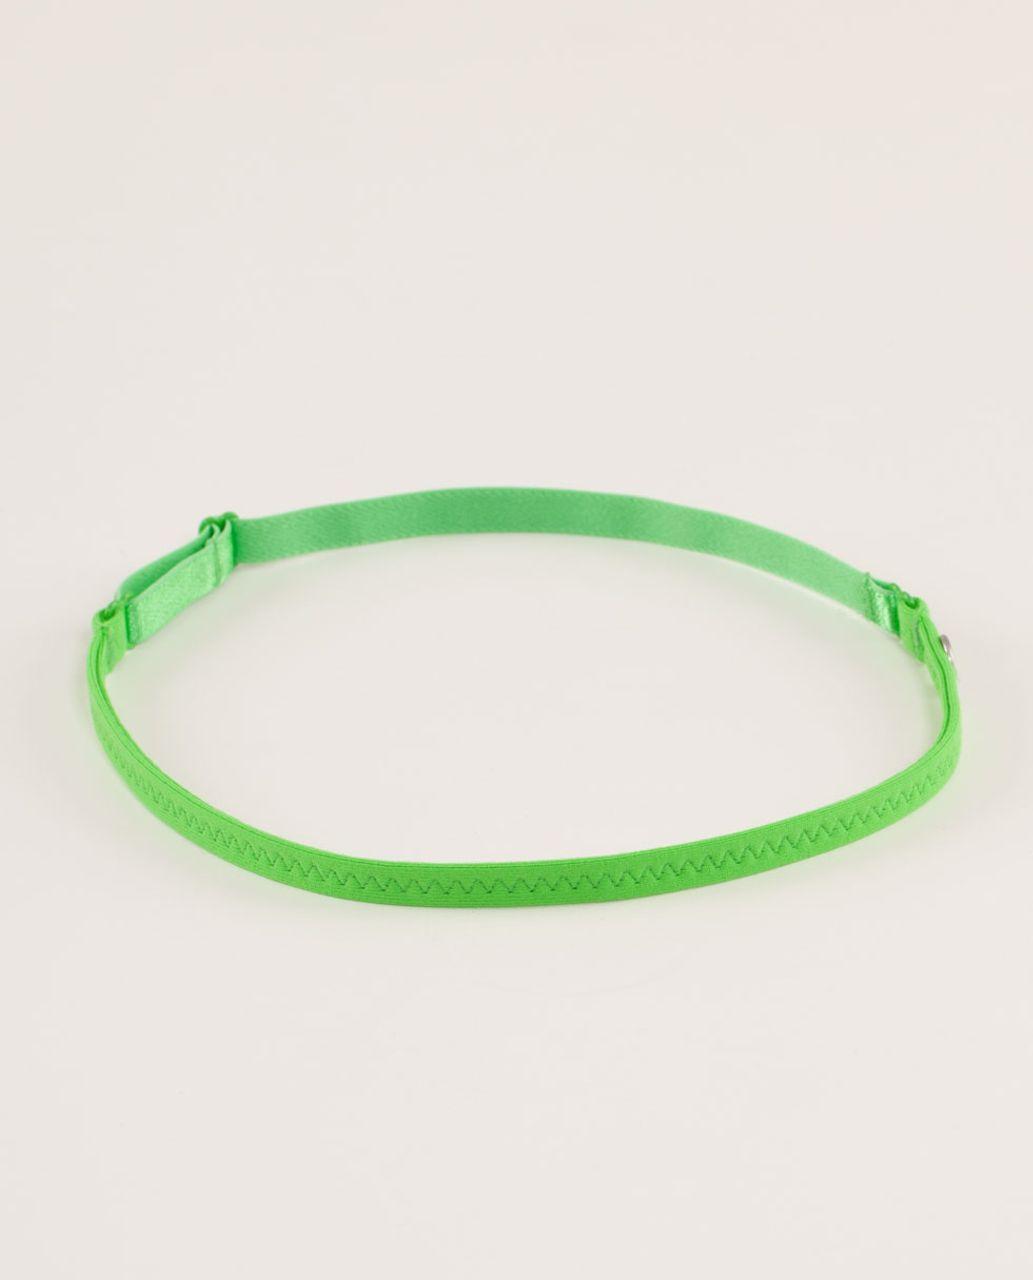 Lululemon Strappy Headband - Frond